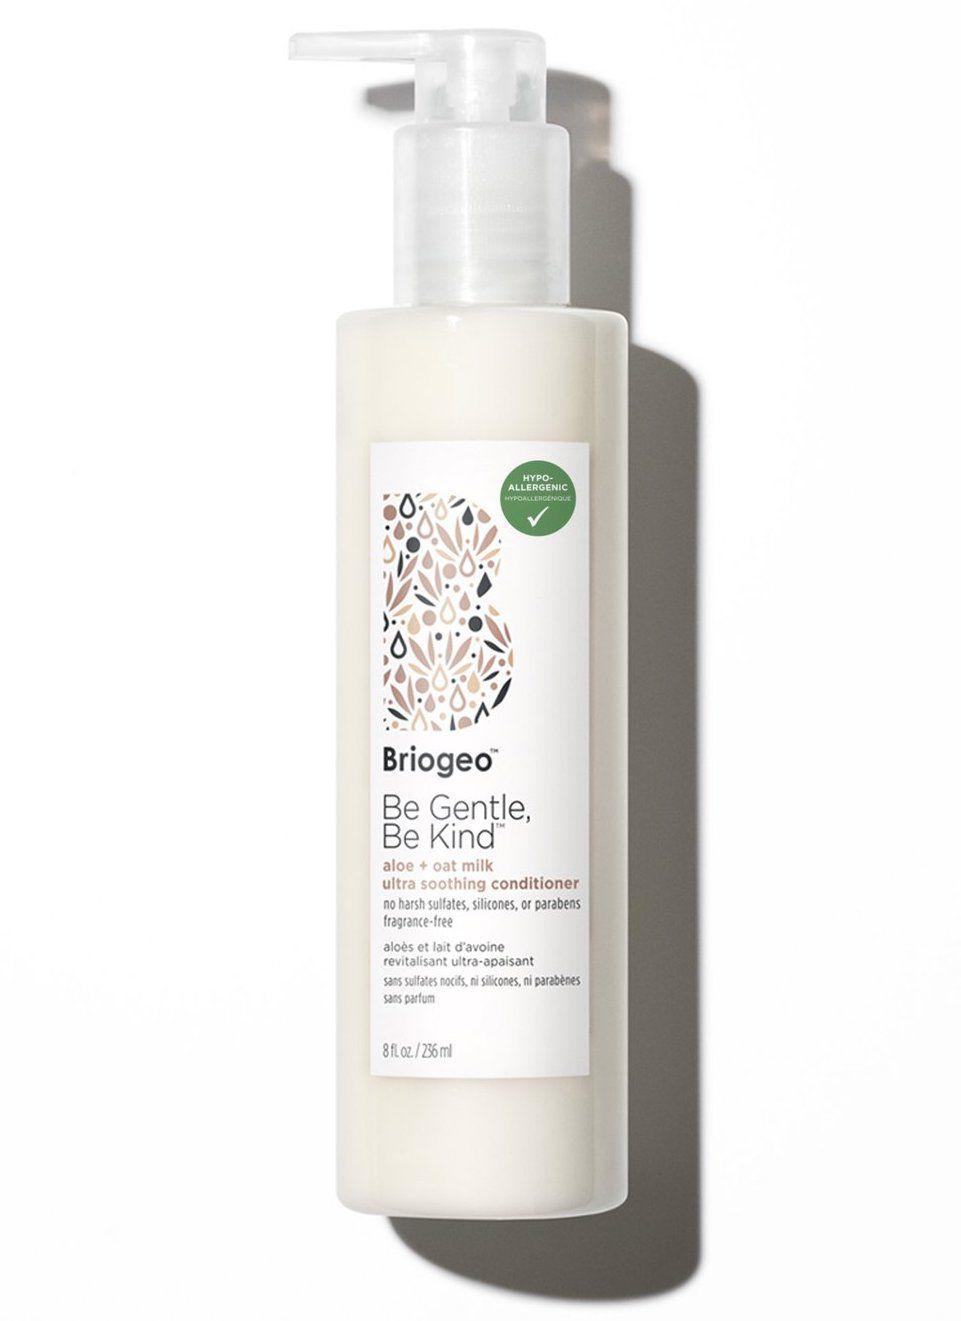 Briogeo Be Gentle, Be Kind Aloe + Oat Milk Ultra Soothing Fragrance-Free Detangler